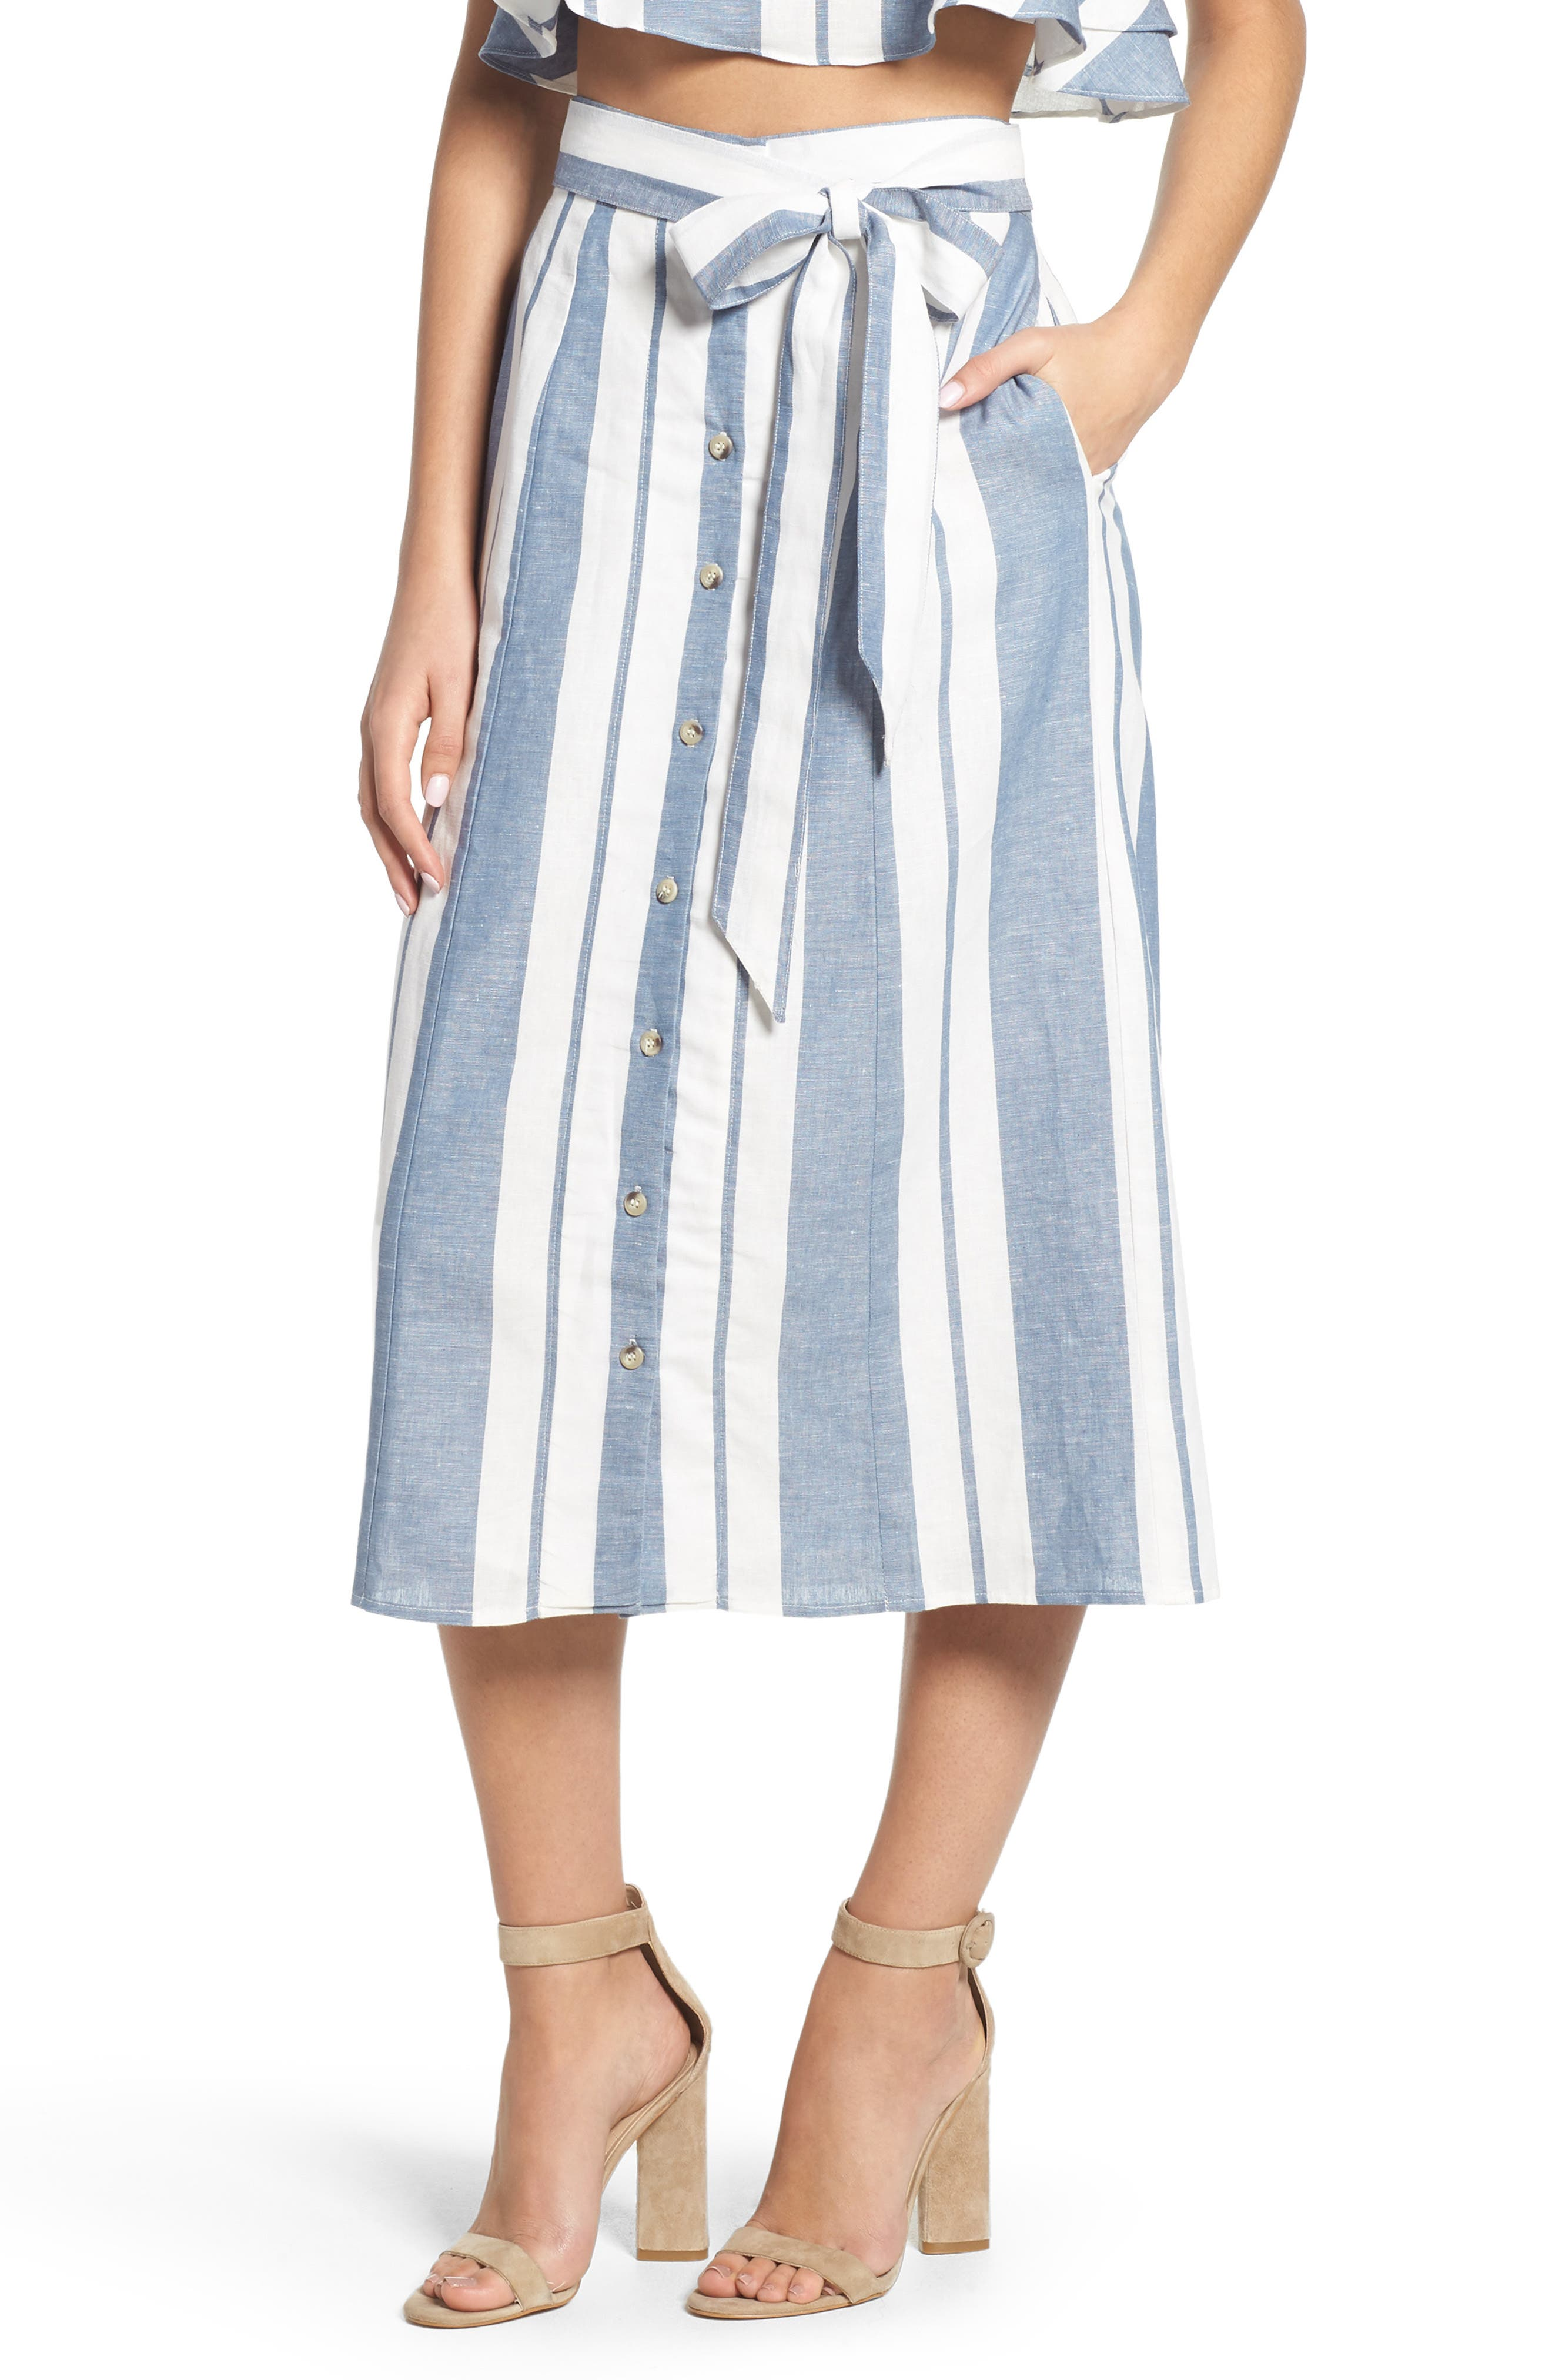 WAYF, Stripe Midi Skirt, Main thumbnail 1, color, 400